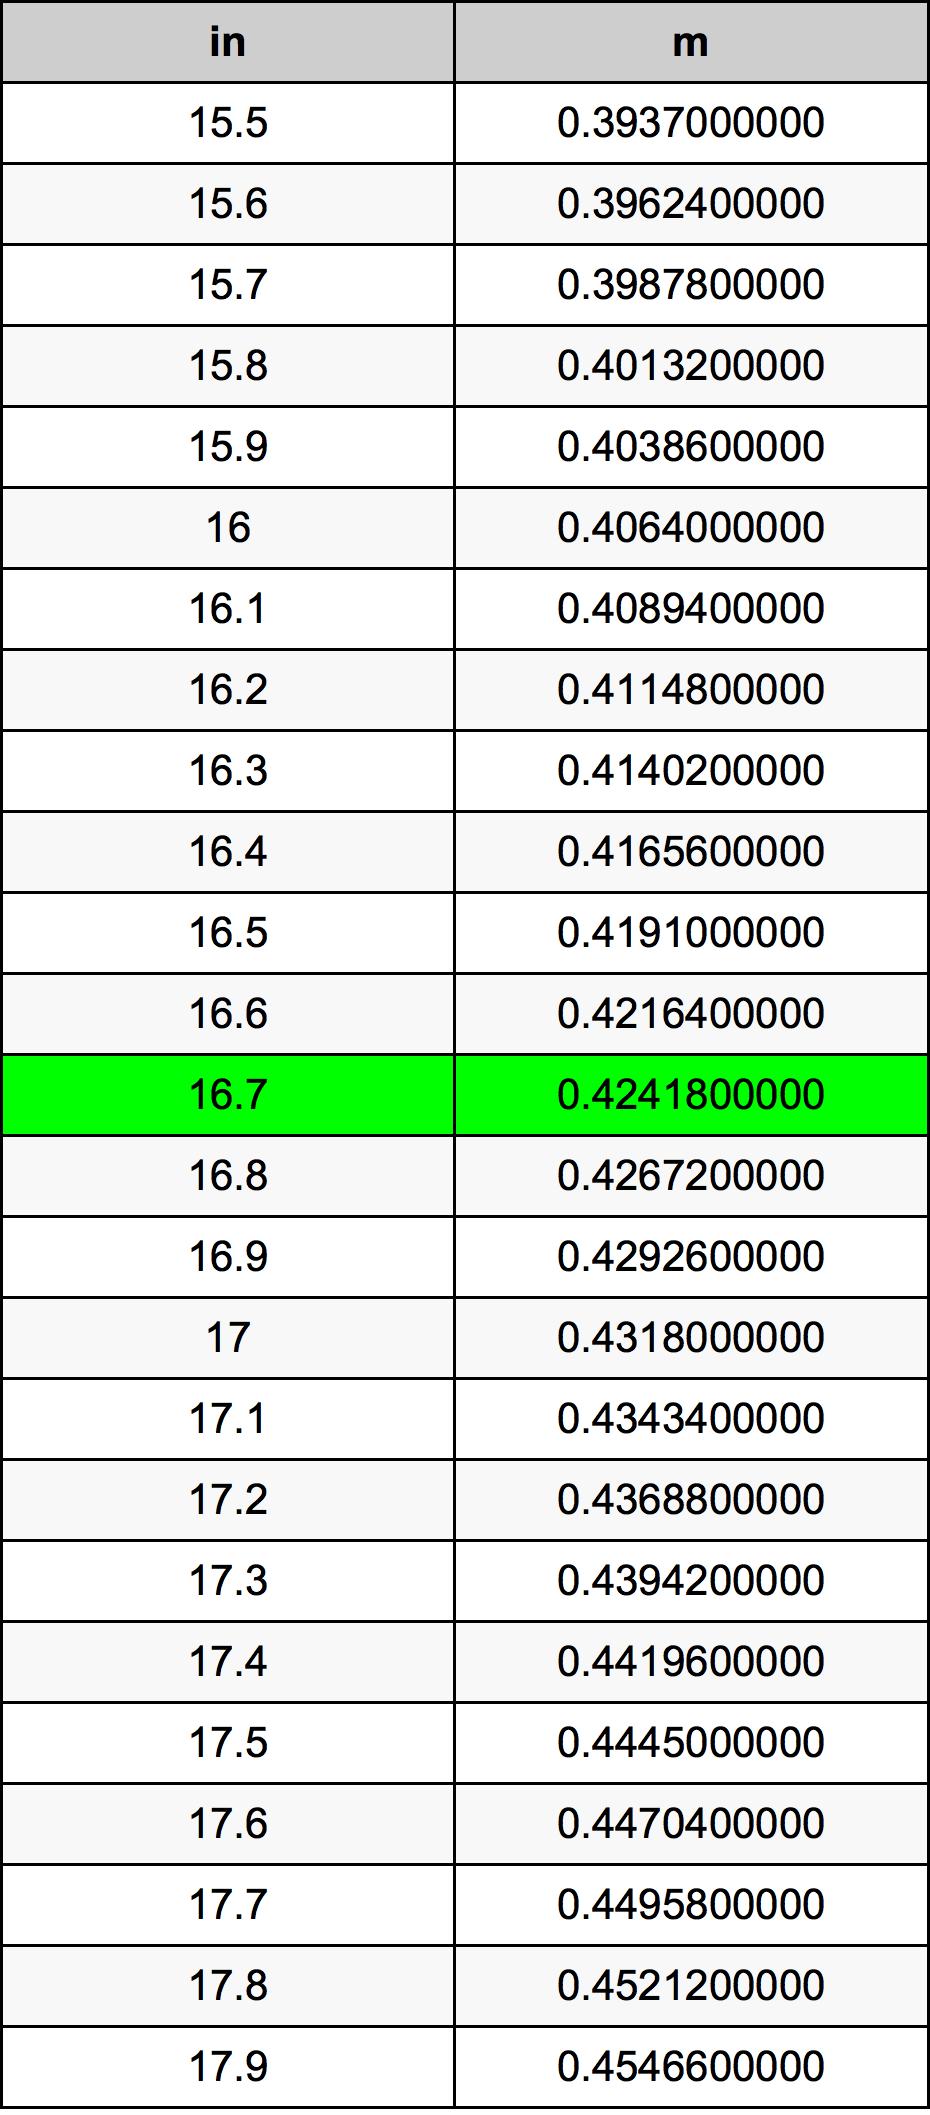 16.7 इंच रूपांतरण सारणी